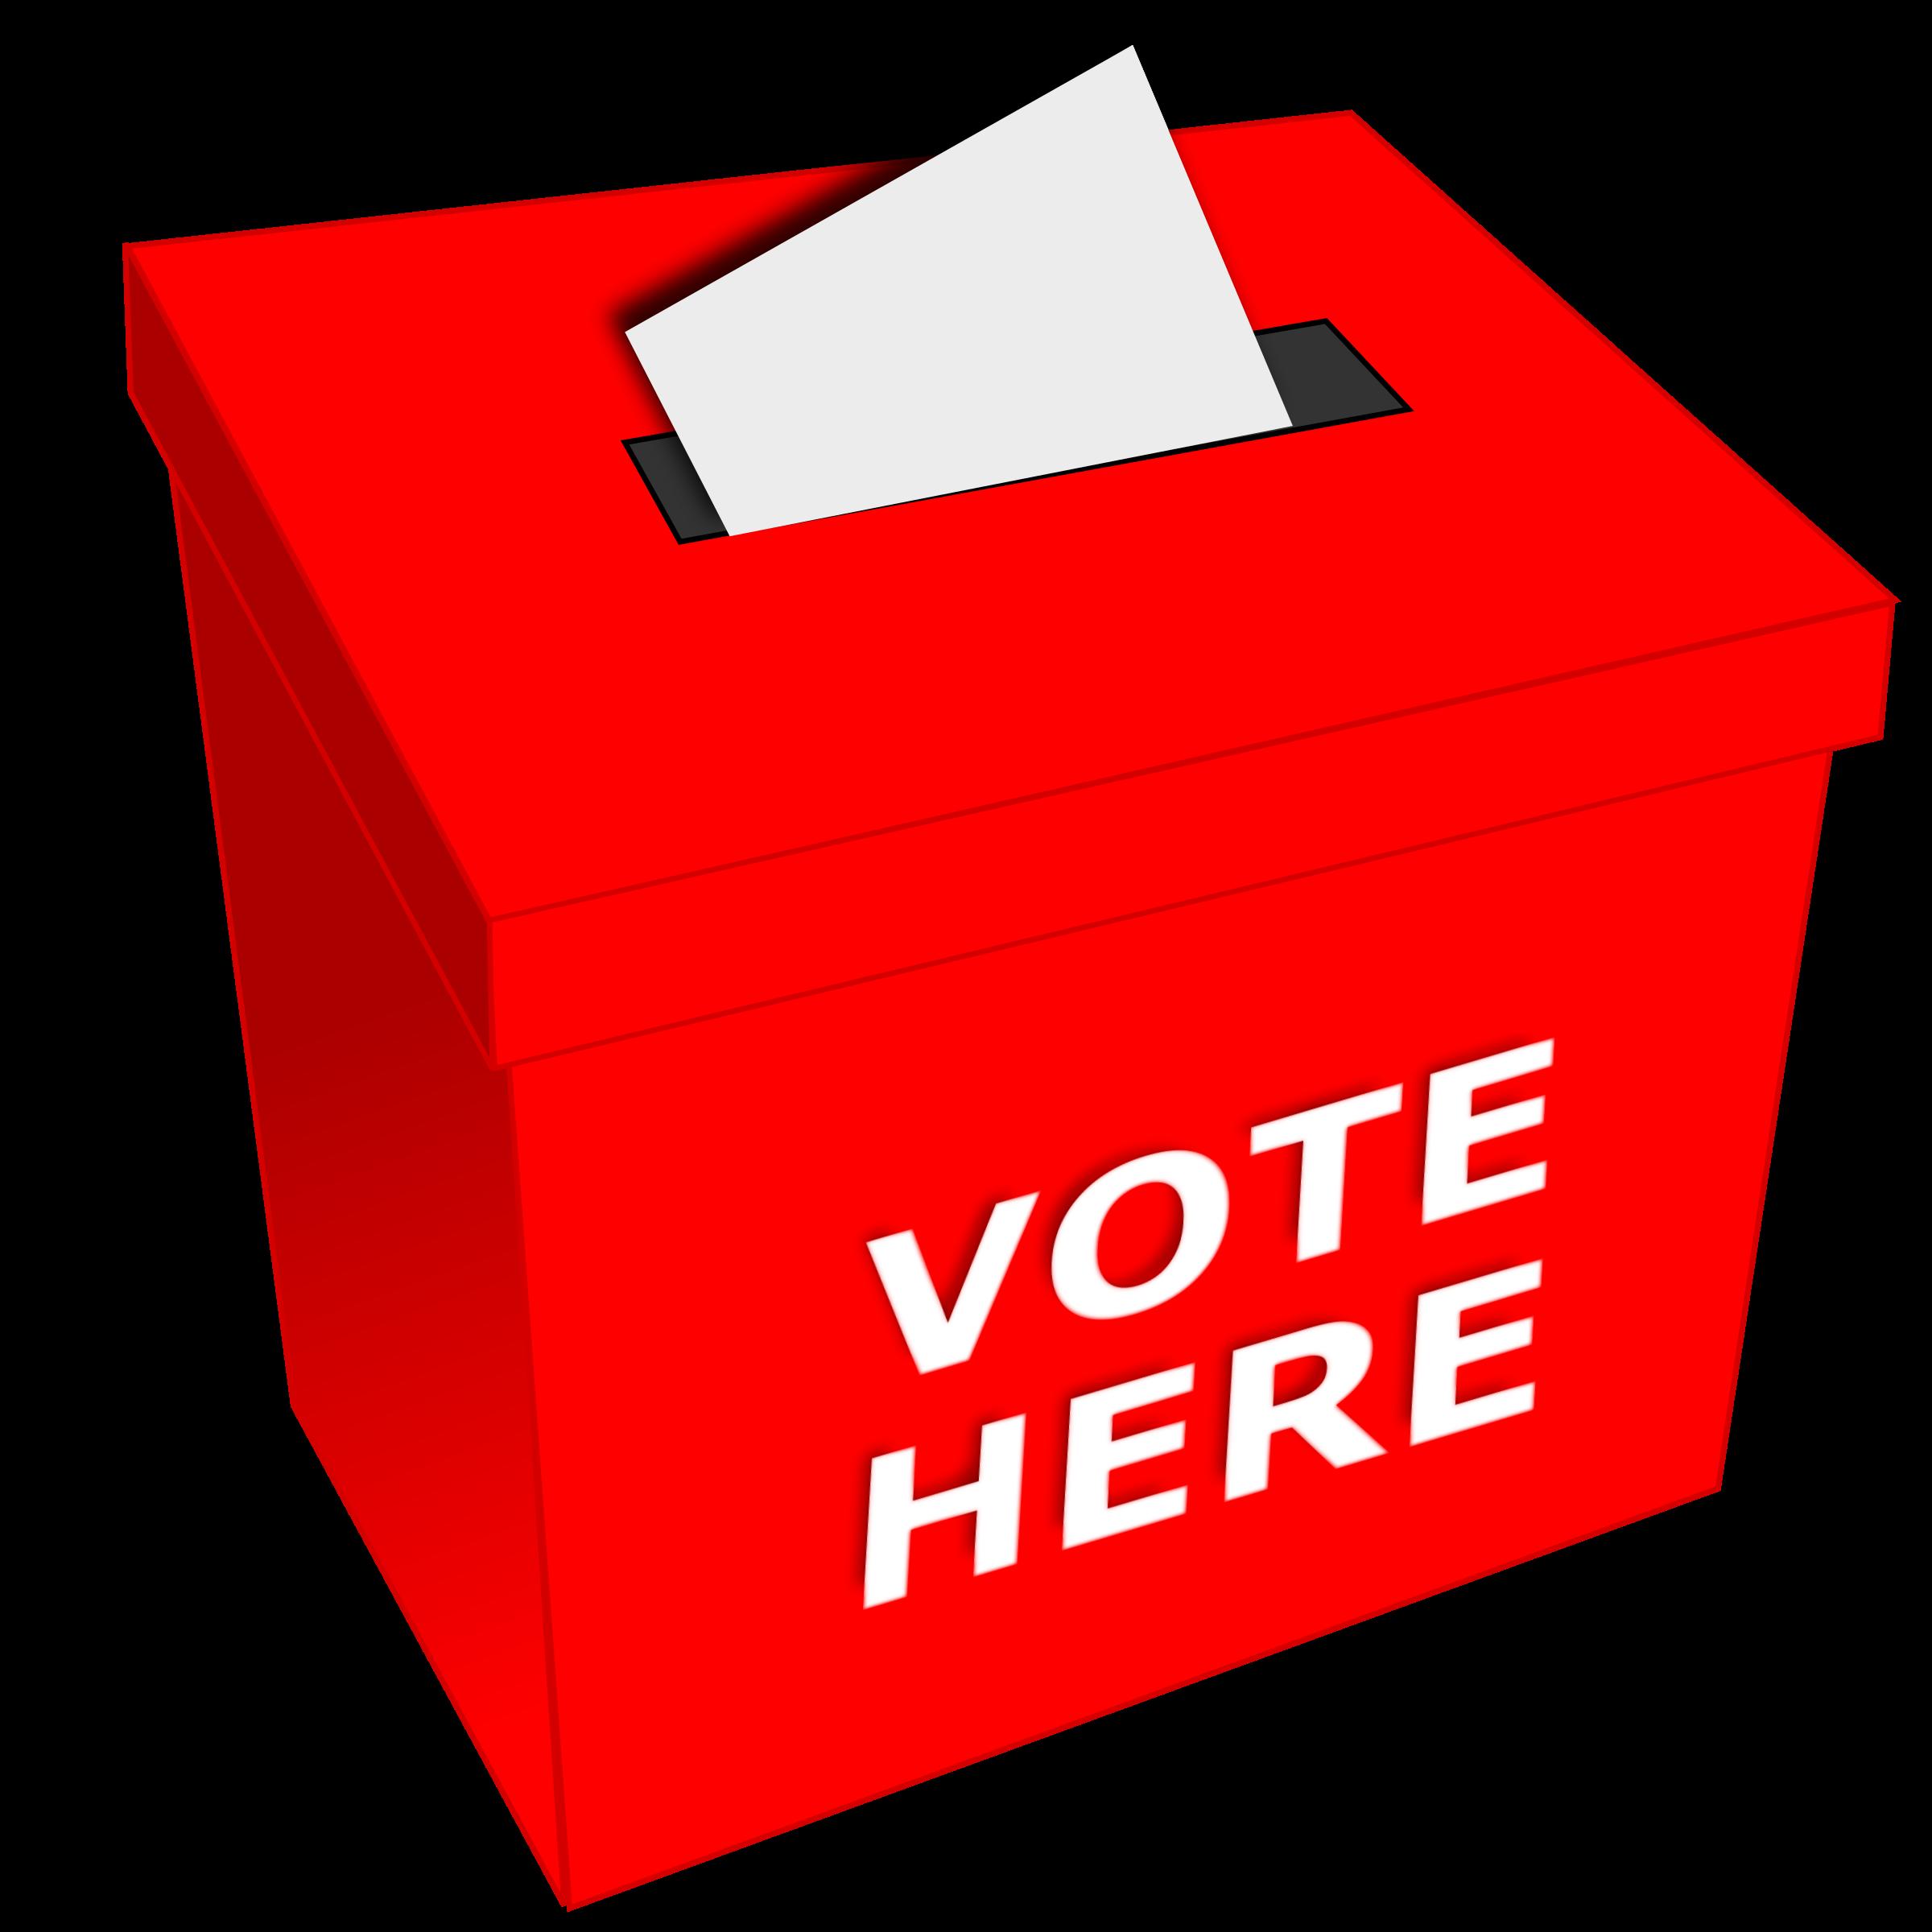 Vote big image png. Voting clipart raffle box